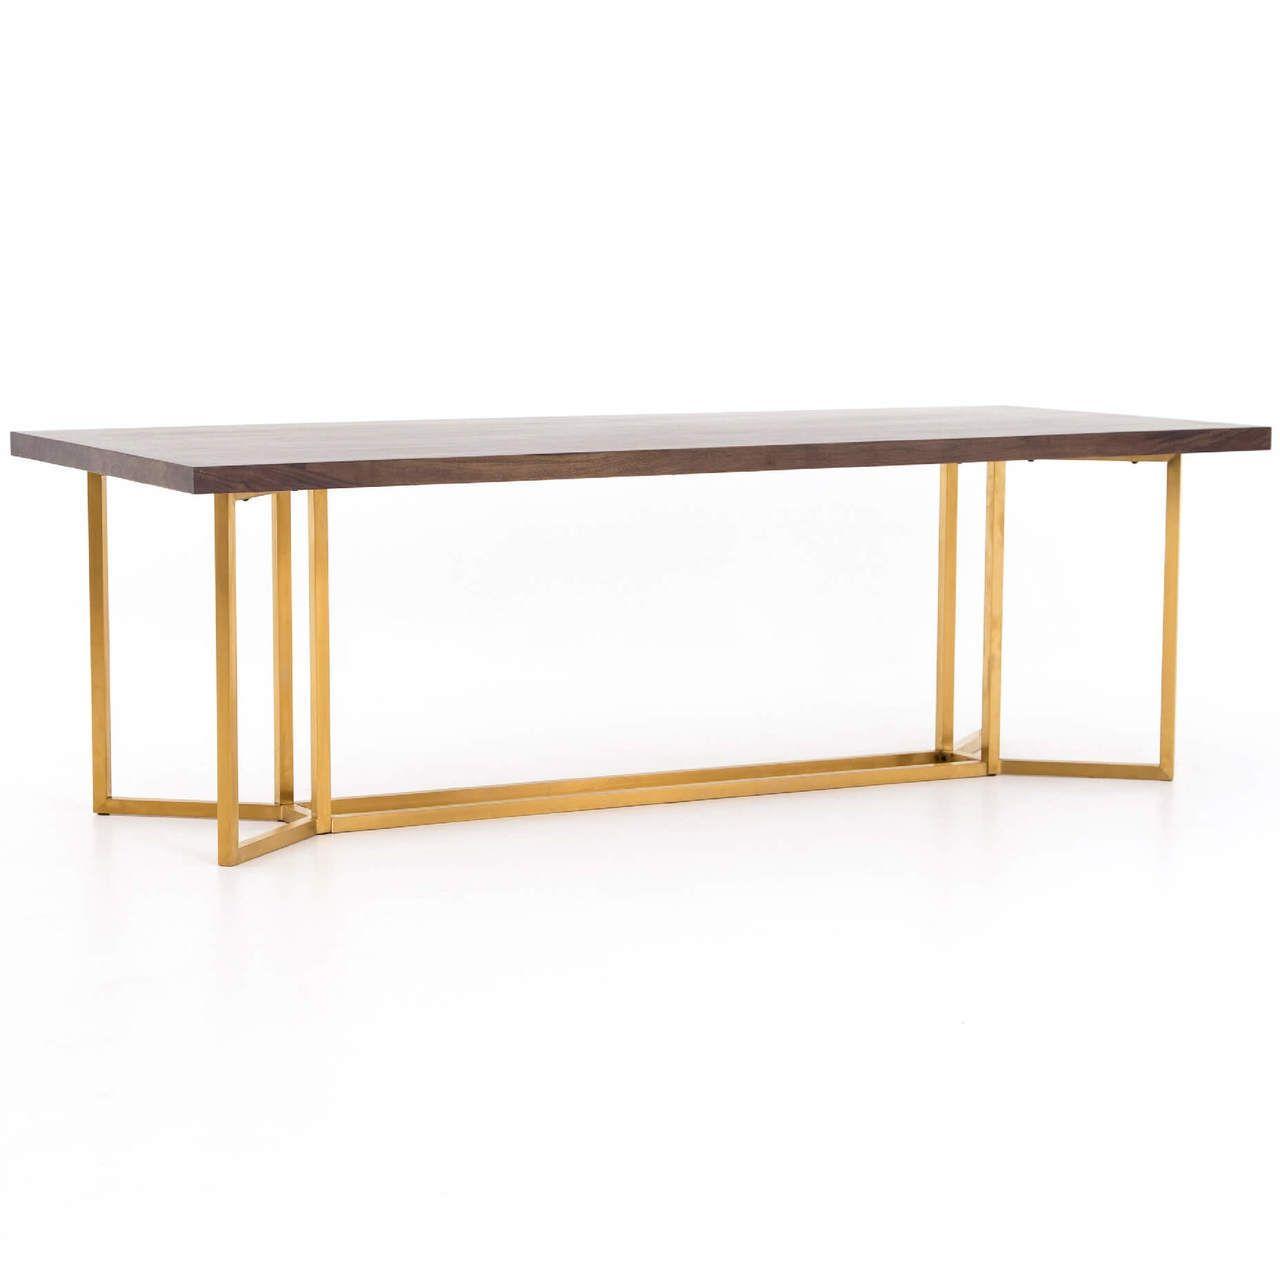 Bryant Polished Brass Leg Walnut Wood Dining Table 95 Wood